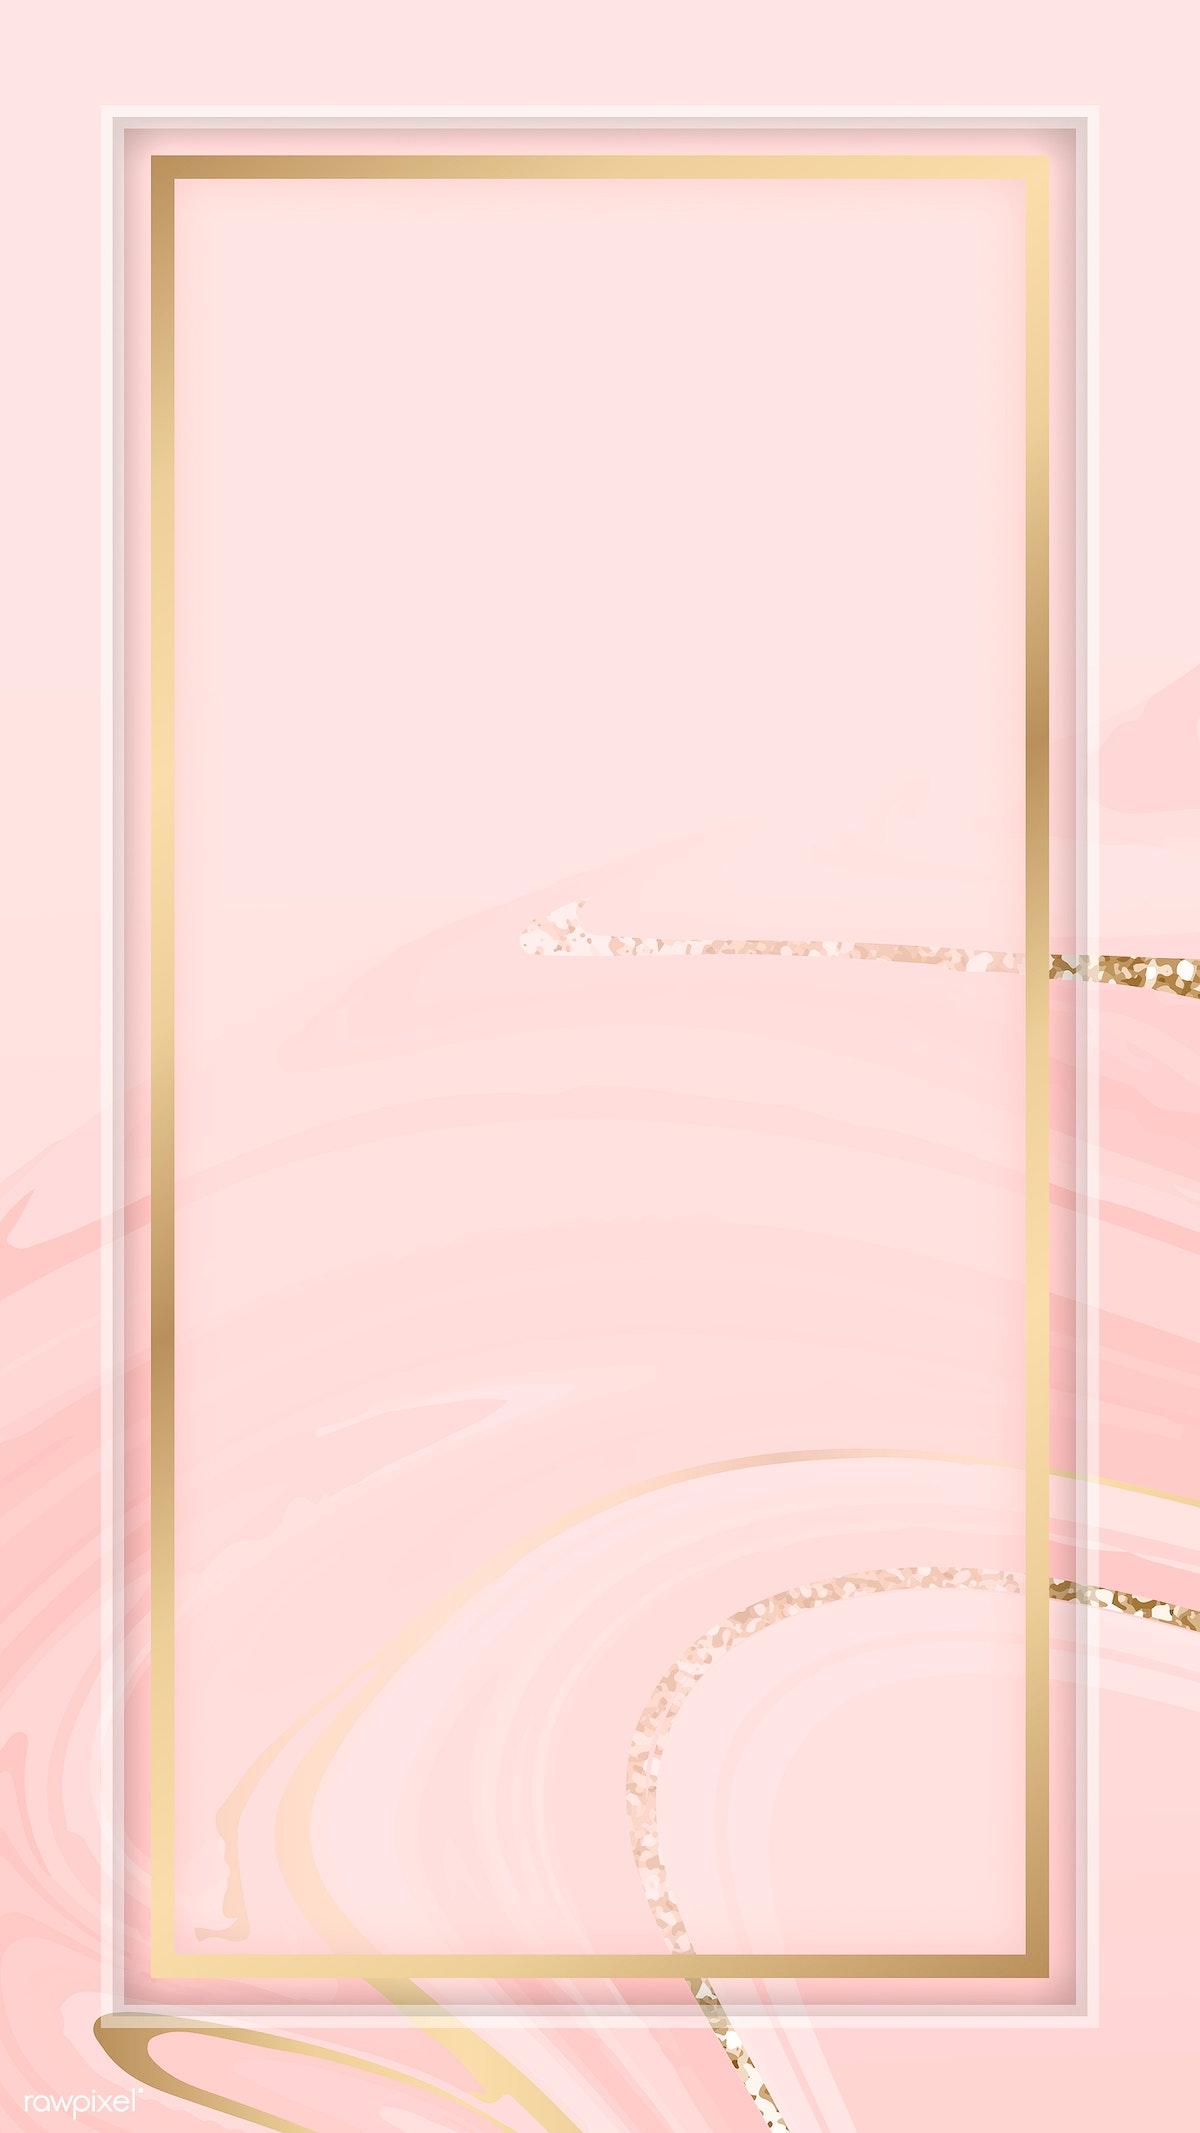 Download premium image of Gold frame on a pink fluid patterned mobile